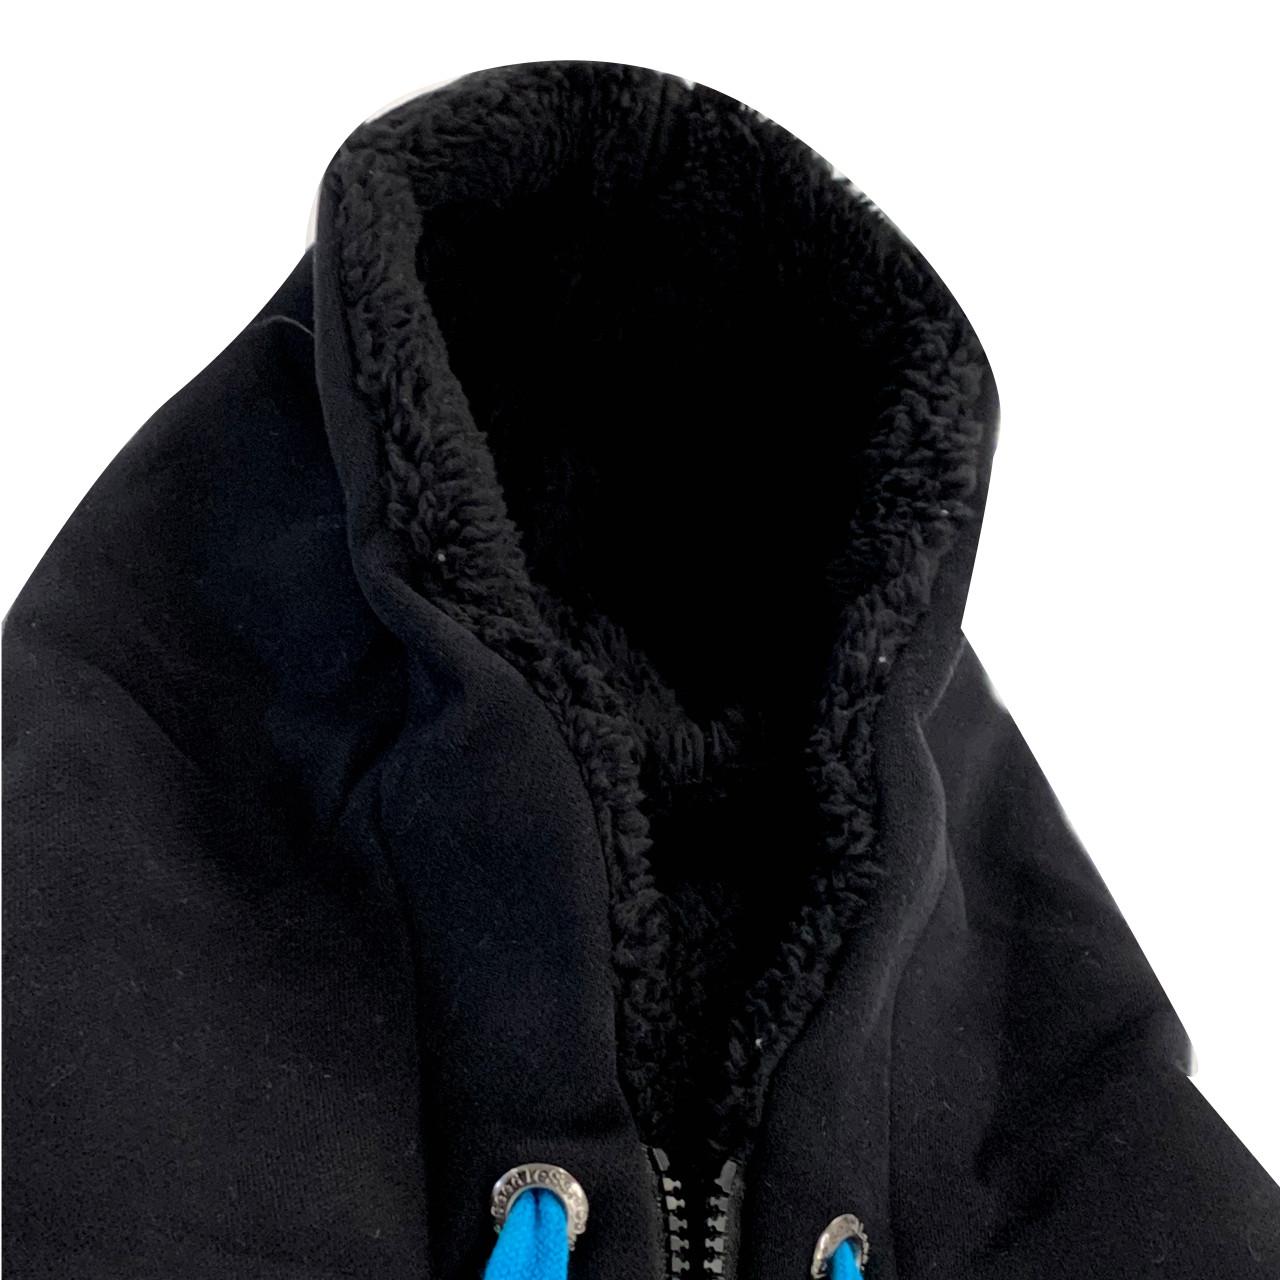 LeDAB X SEEDLESS Colab Custom Hoodie